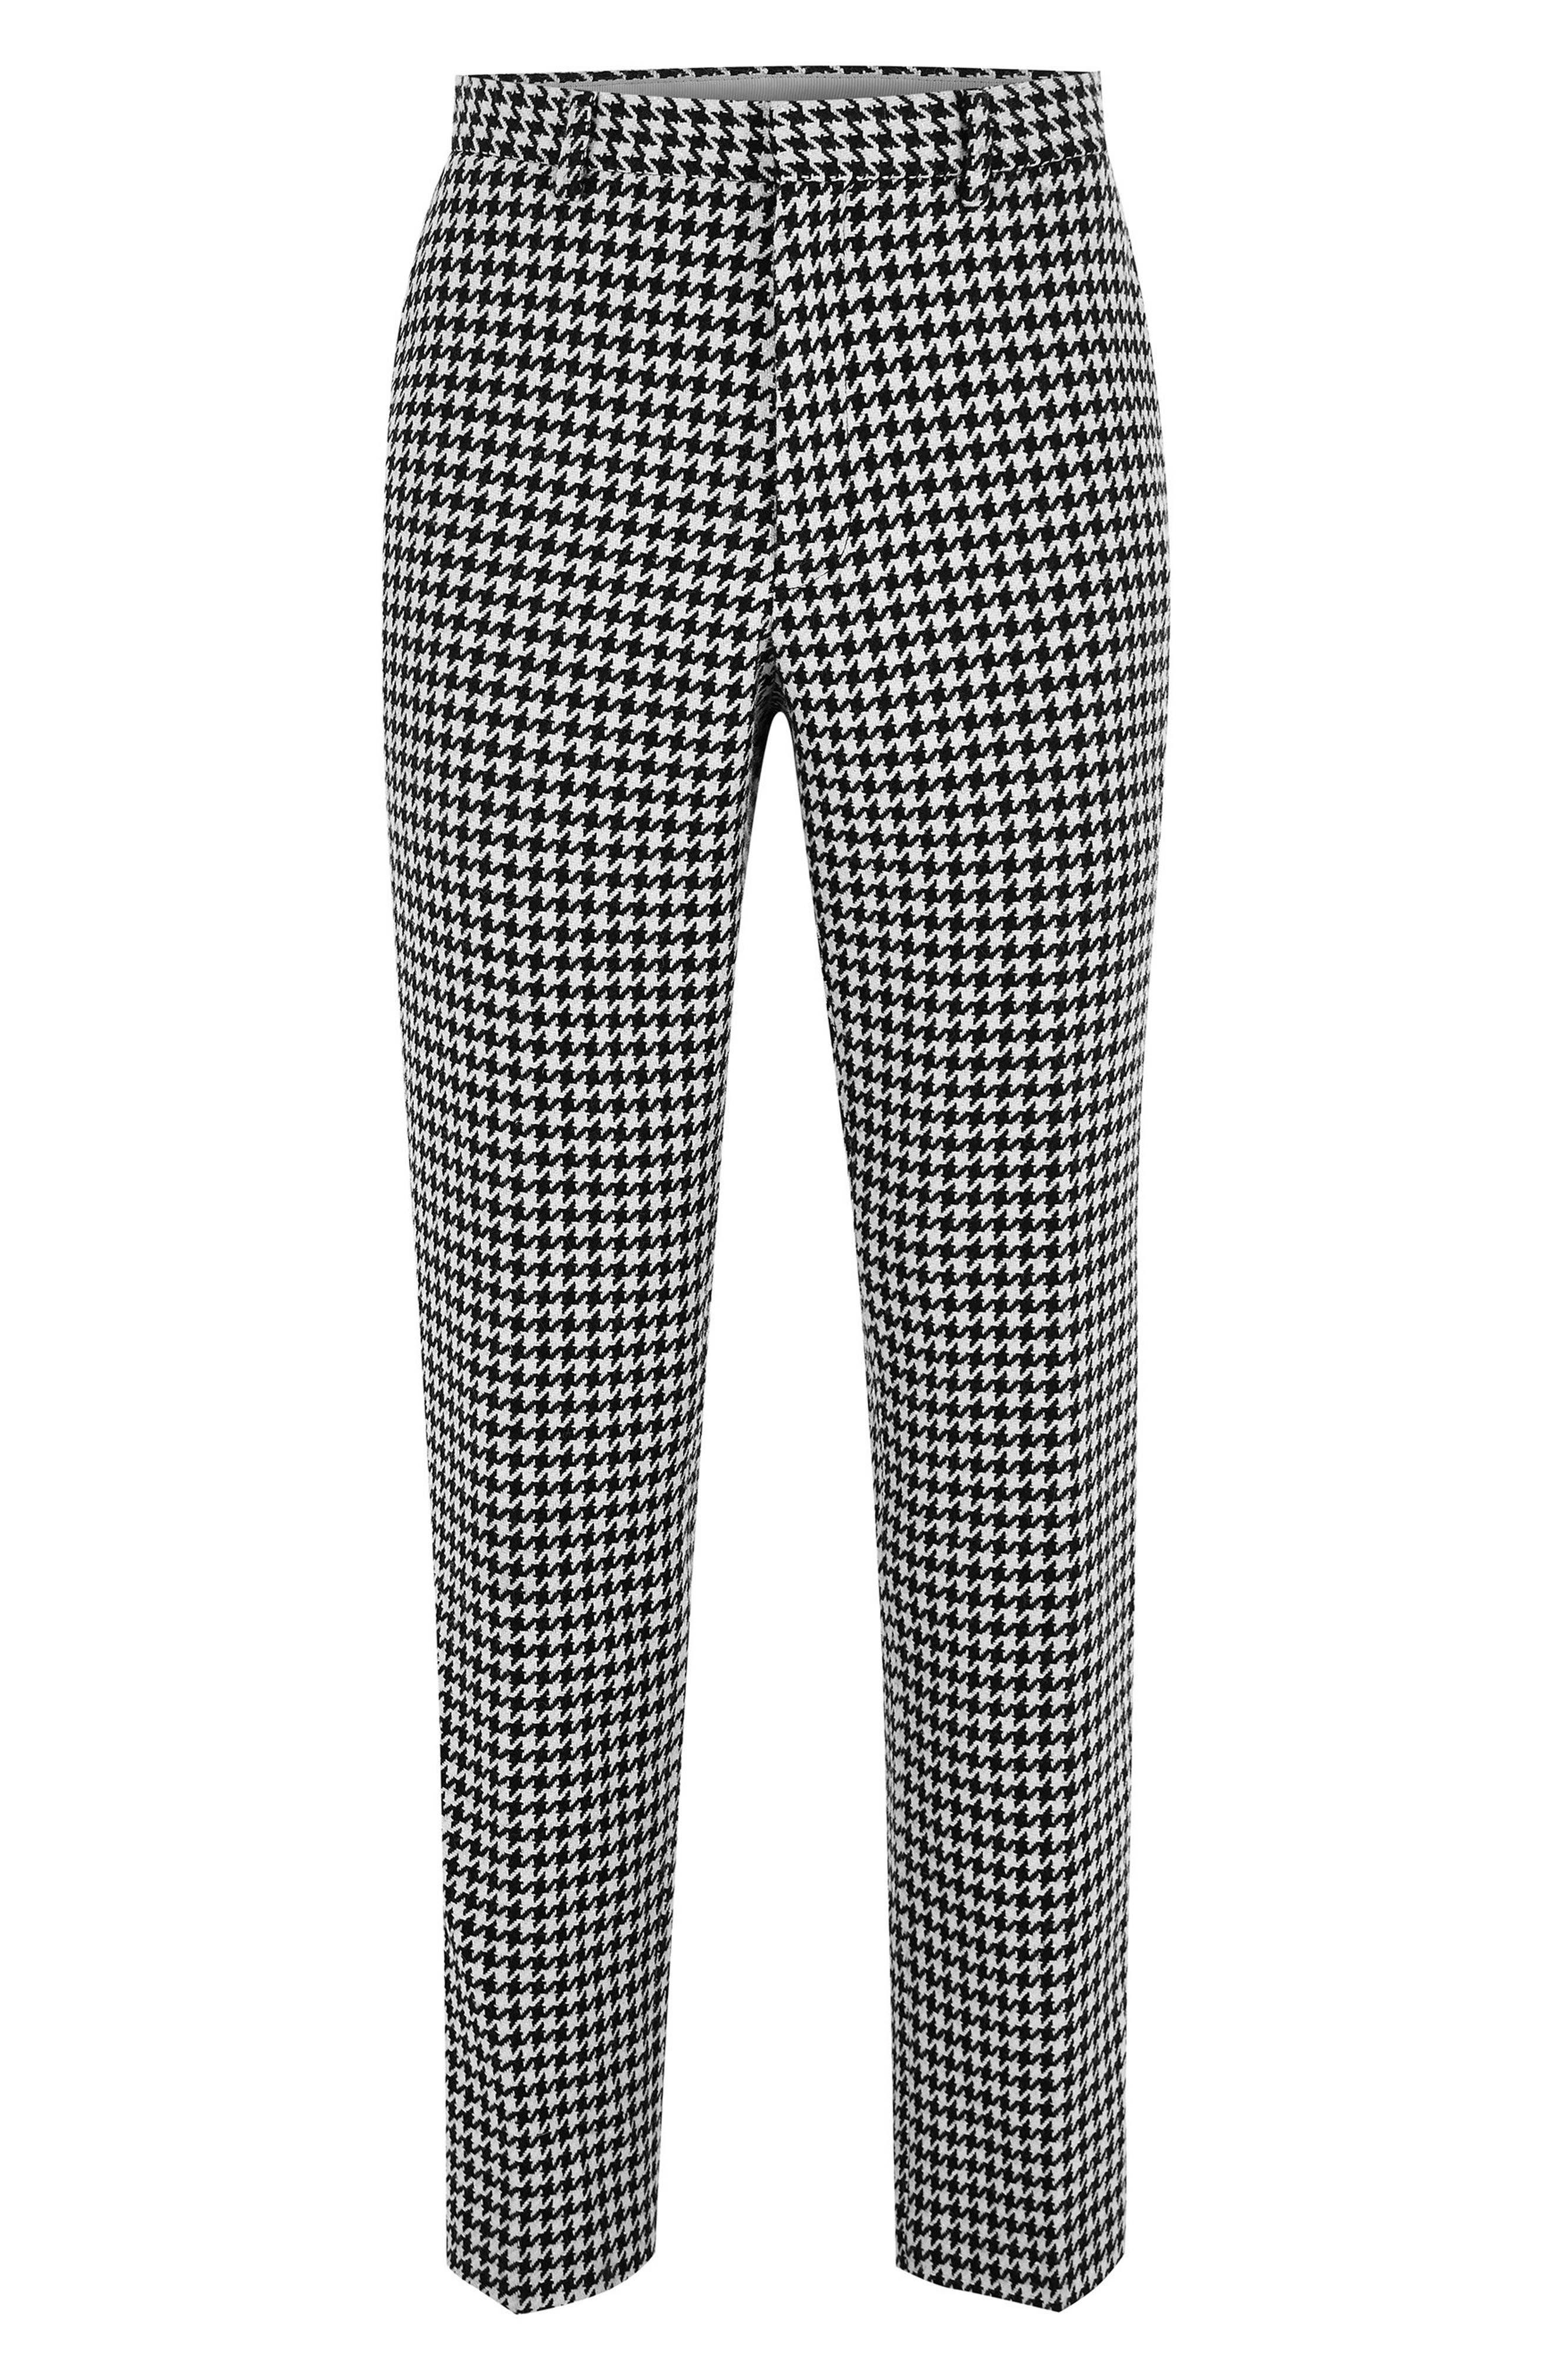 TOPMAN, Roe Skinny Fit Trousers, Alternate thumbnail 4, color, 001